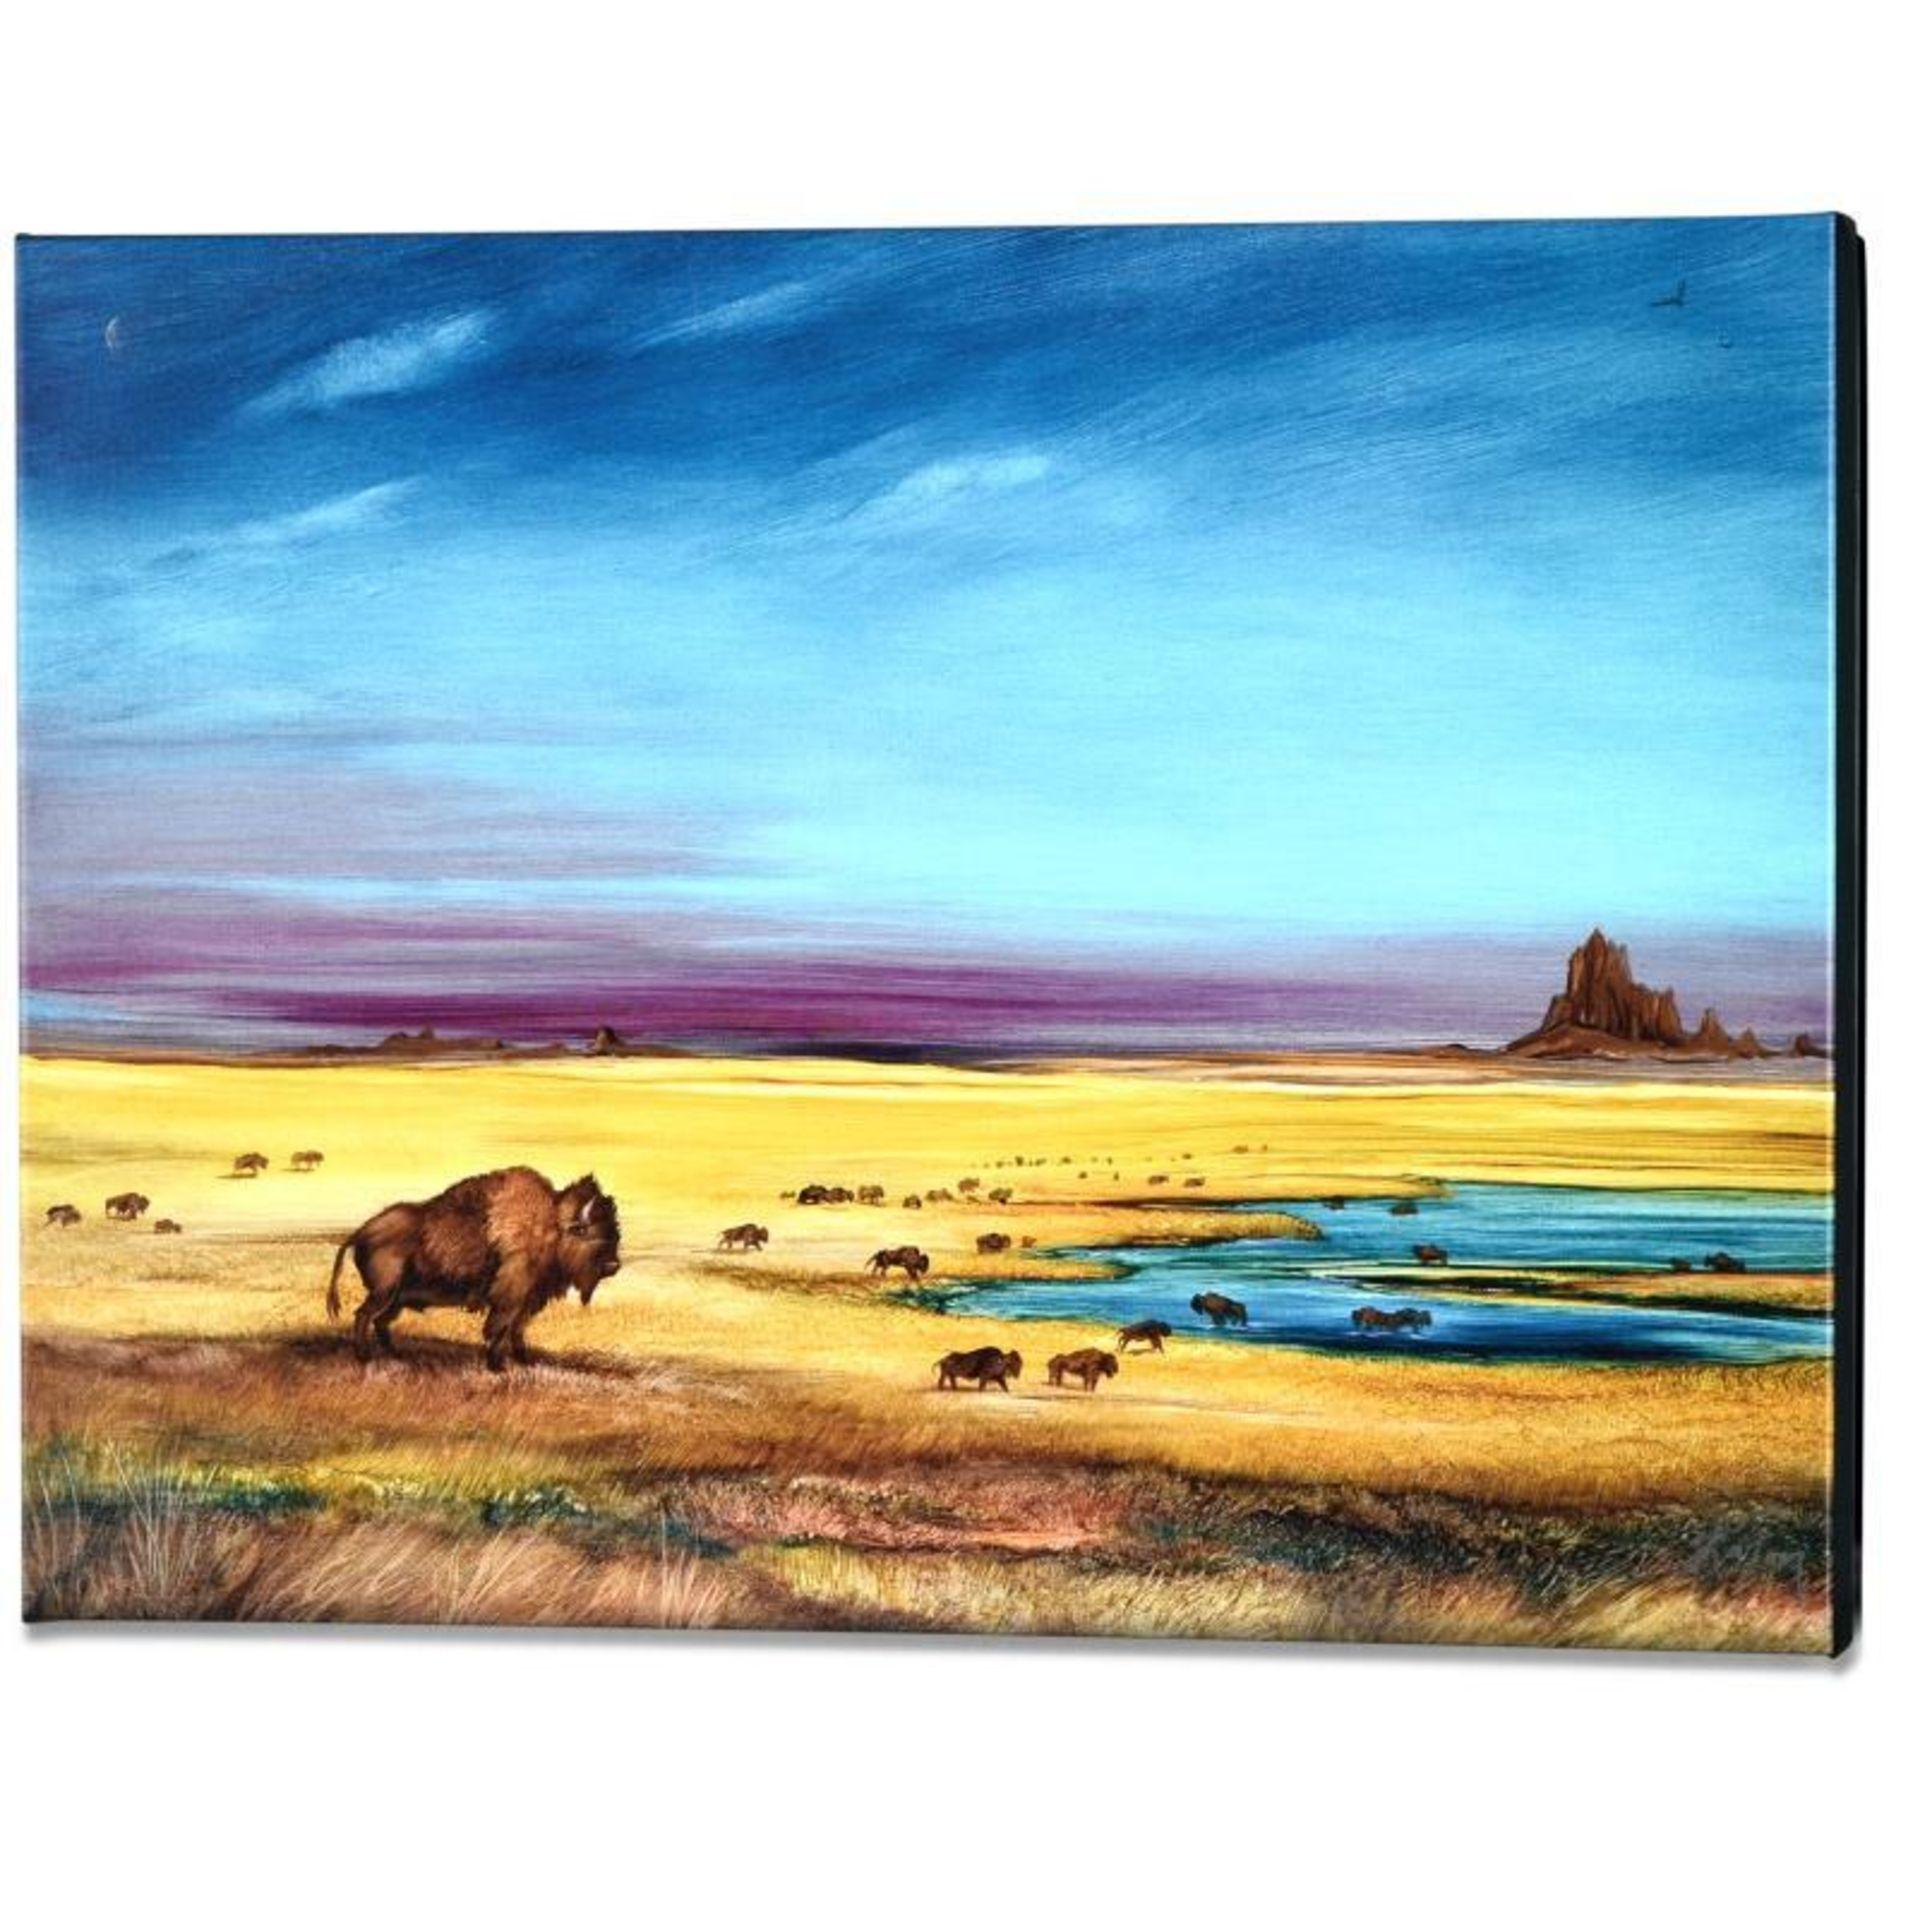 Where the Buffalo by Katon, Martin - Image 3 of 4